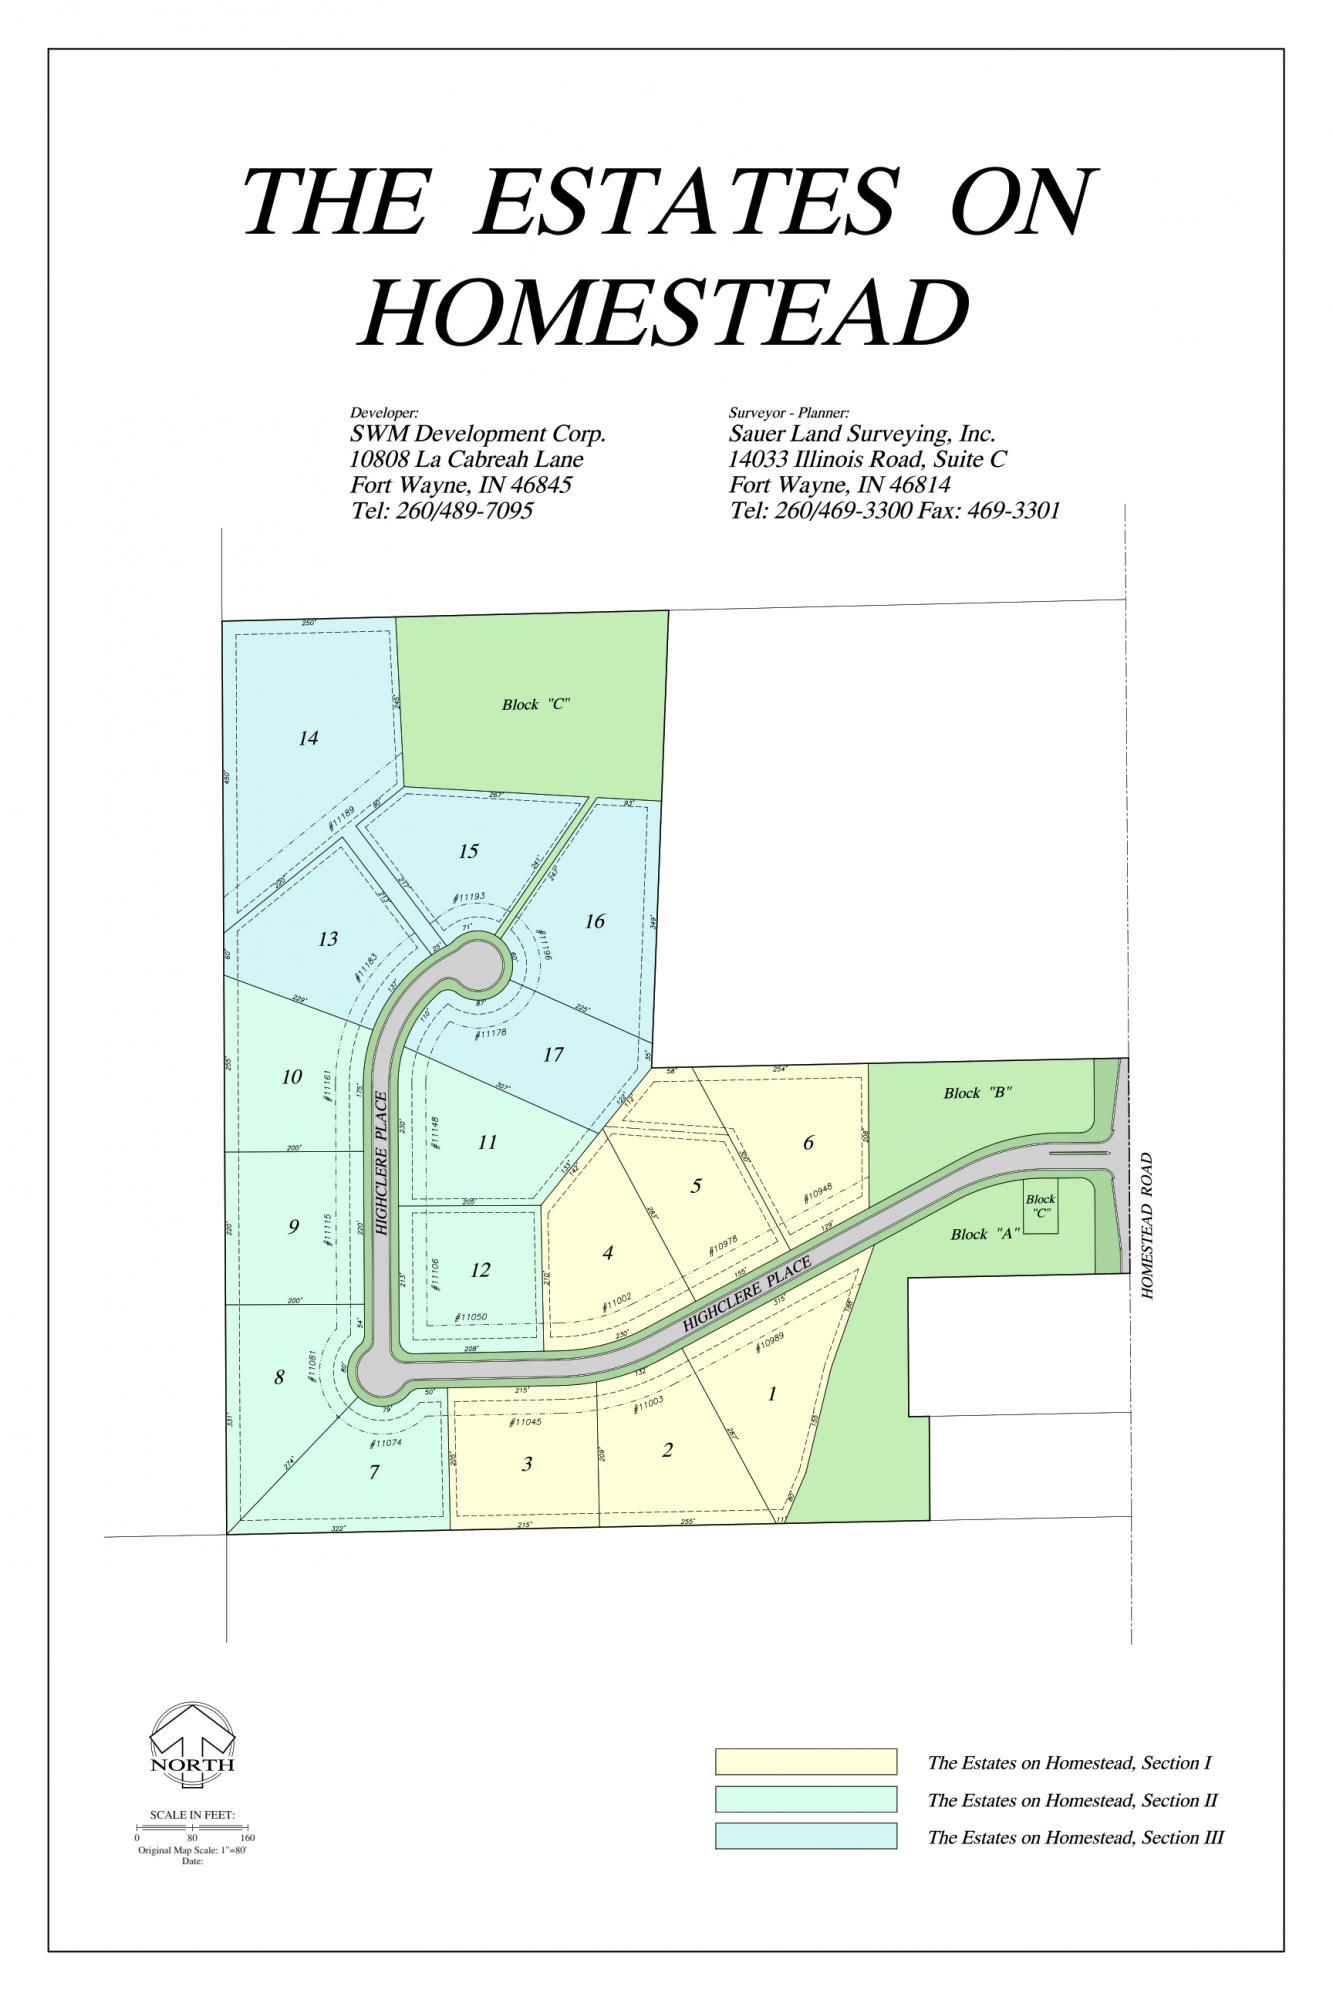 The Estates on Homestead